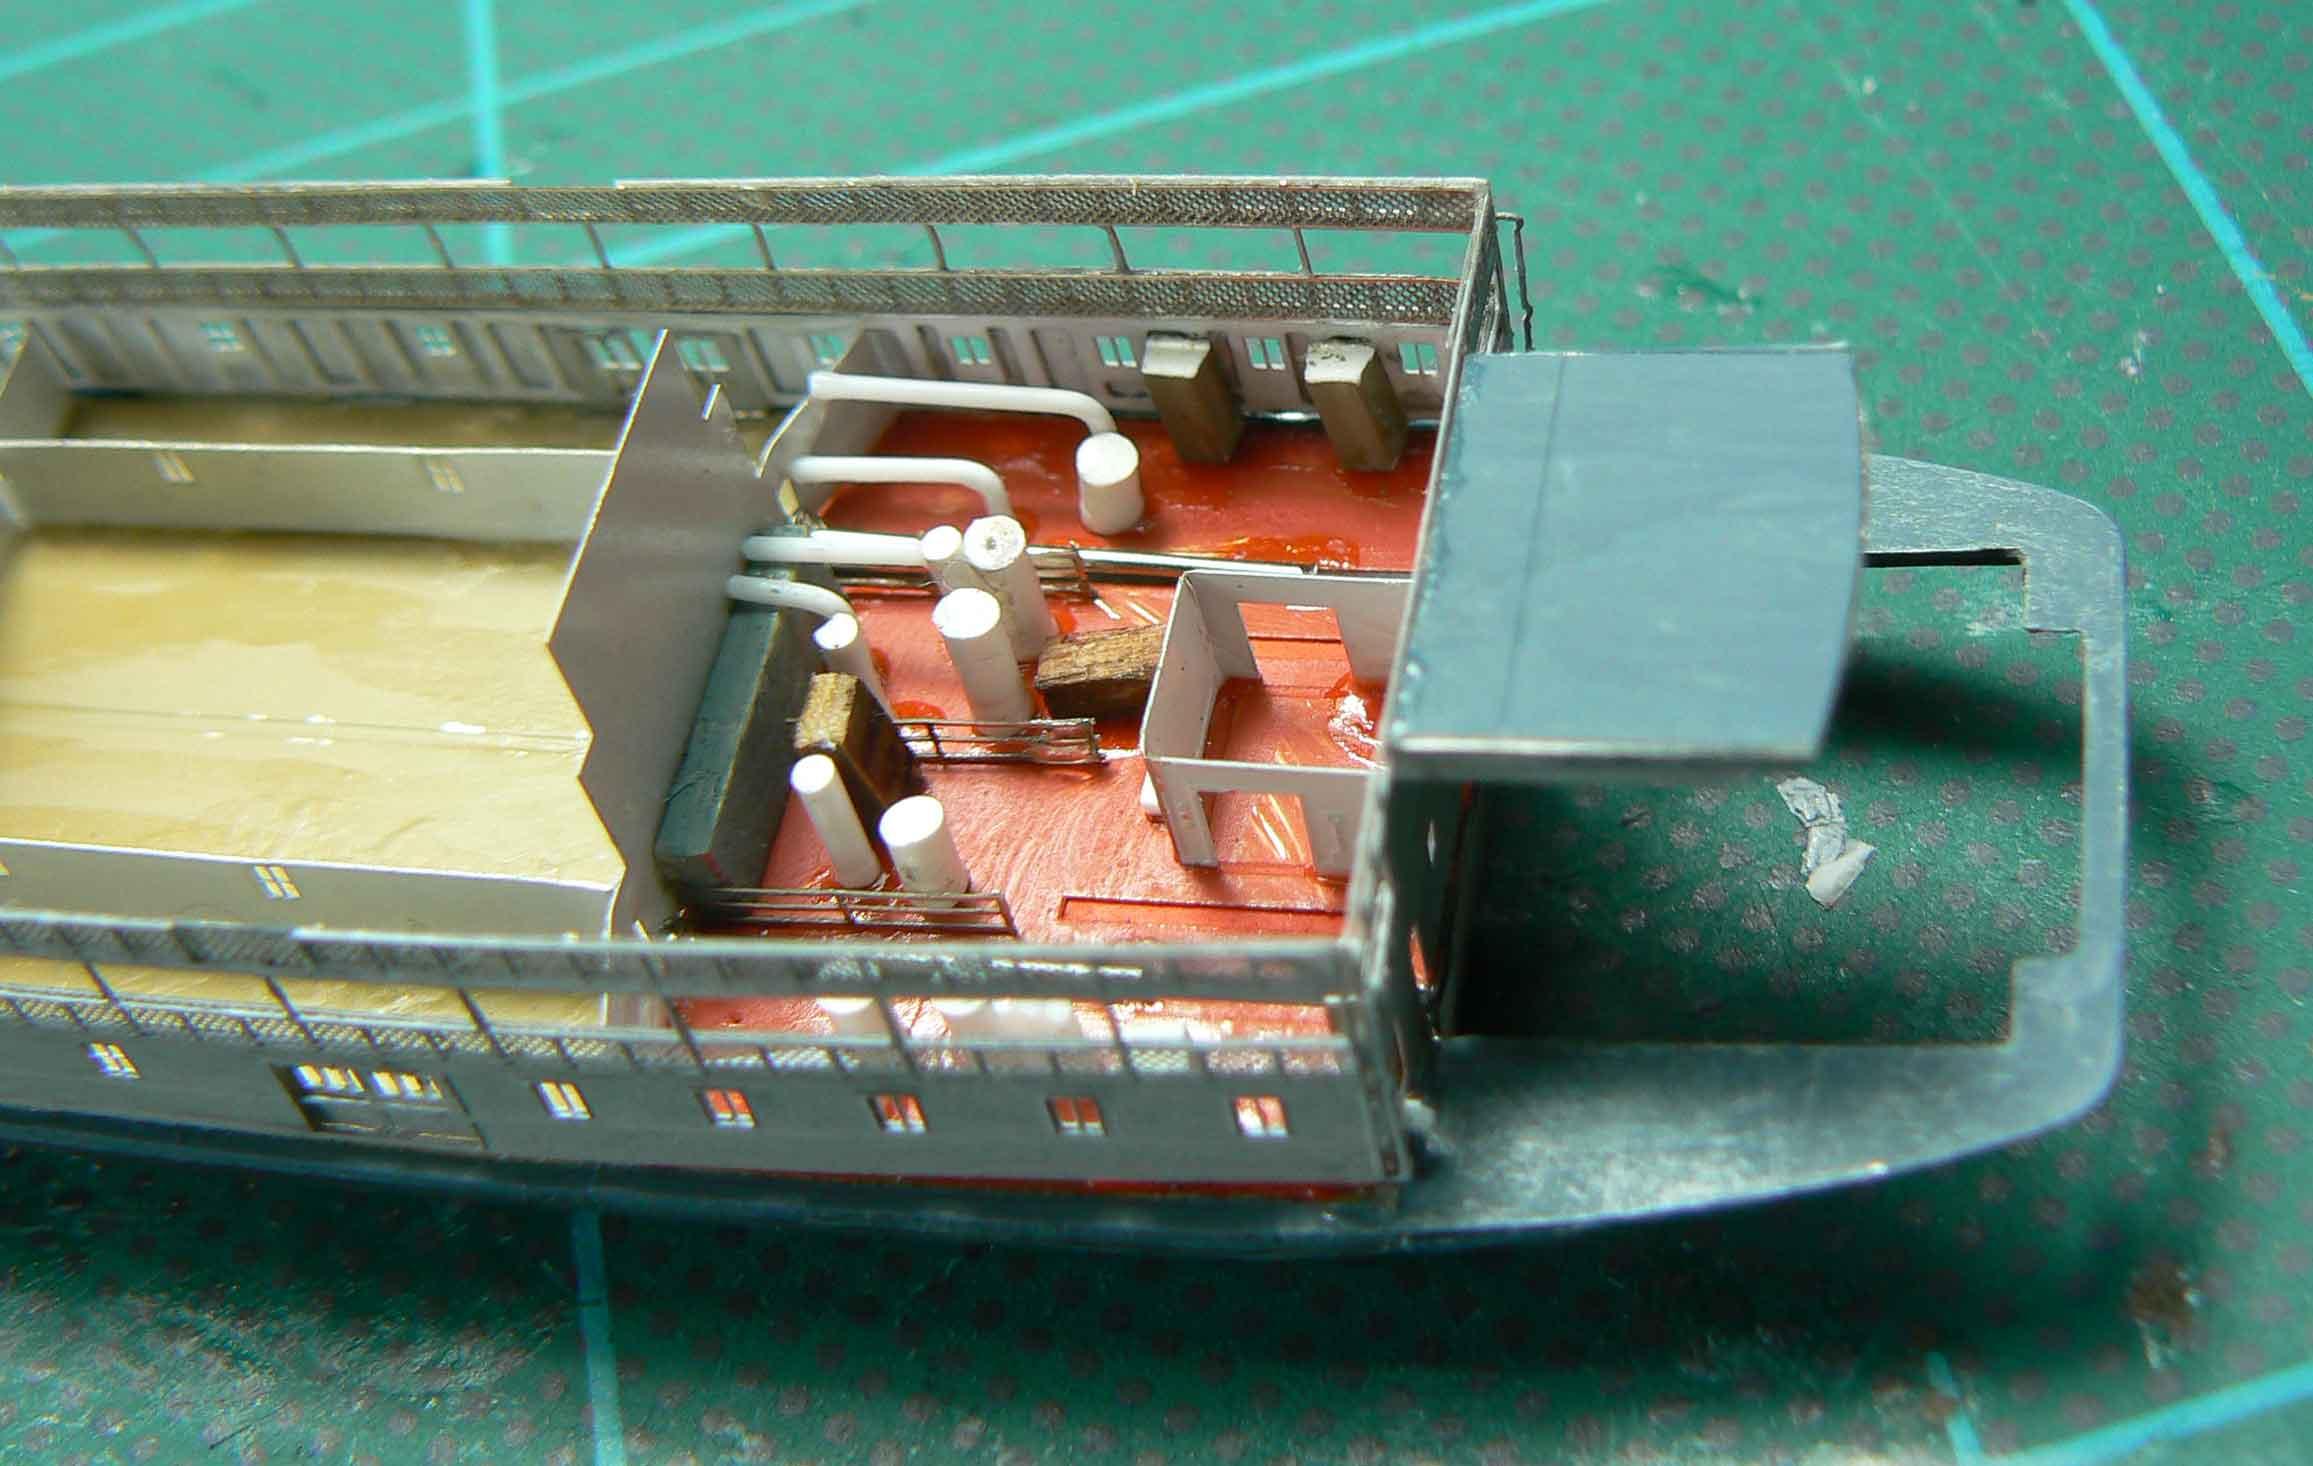 MARE ISLAND NAVAL SHIP YARD  1/700 Pq6ecx